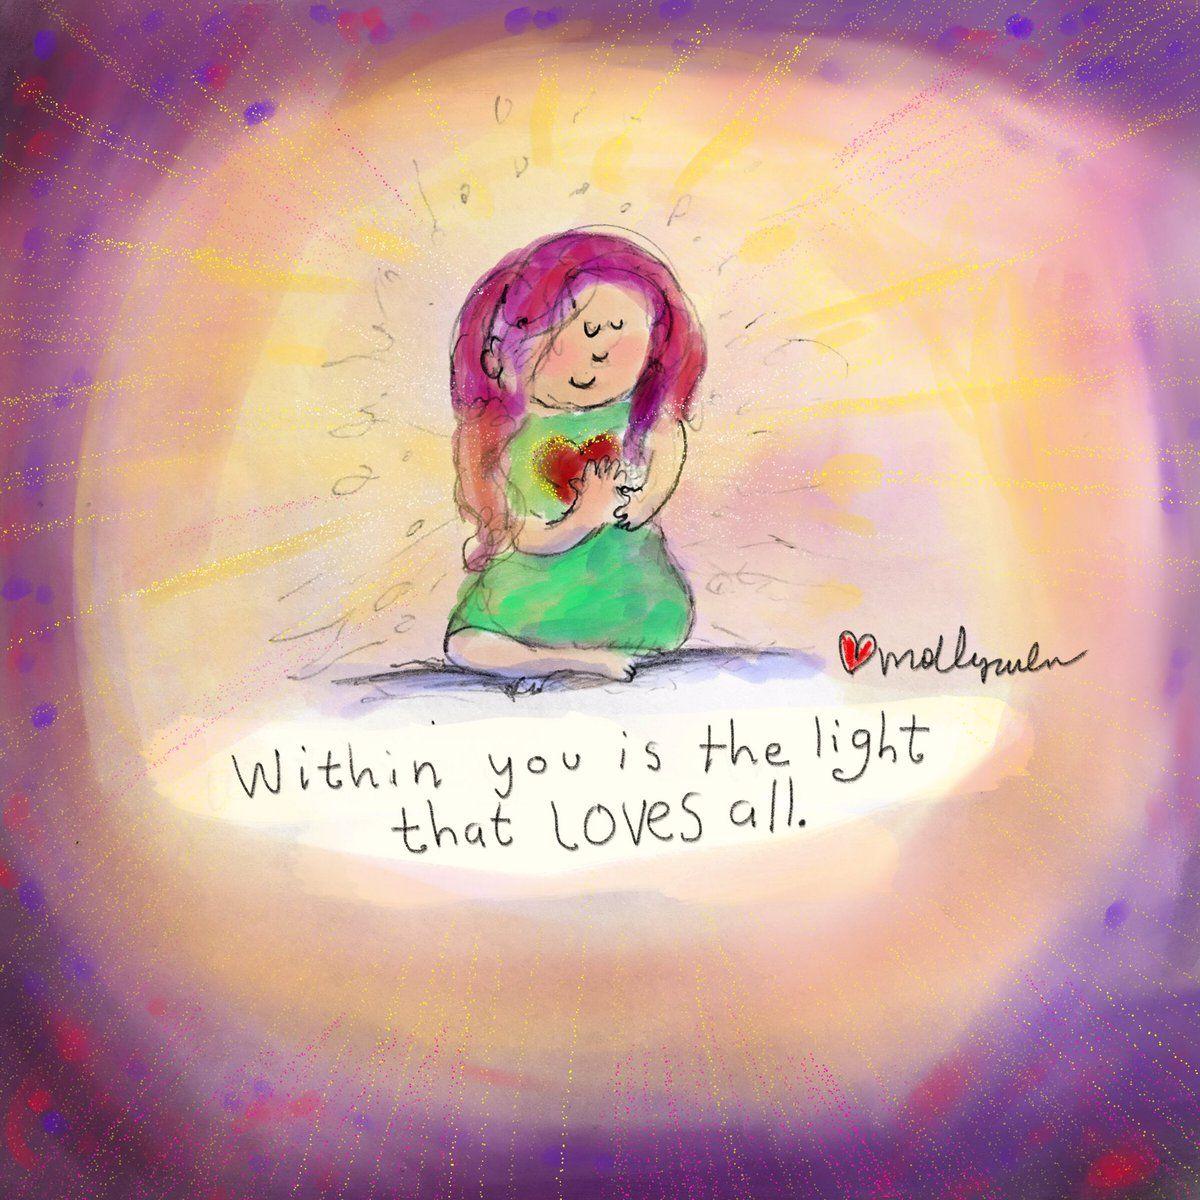 Gratitude Buddha Quotes: Buddha Doodles (@BuddhaDoodles)